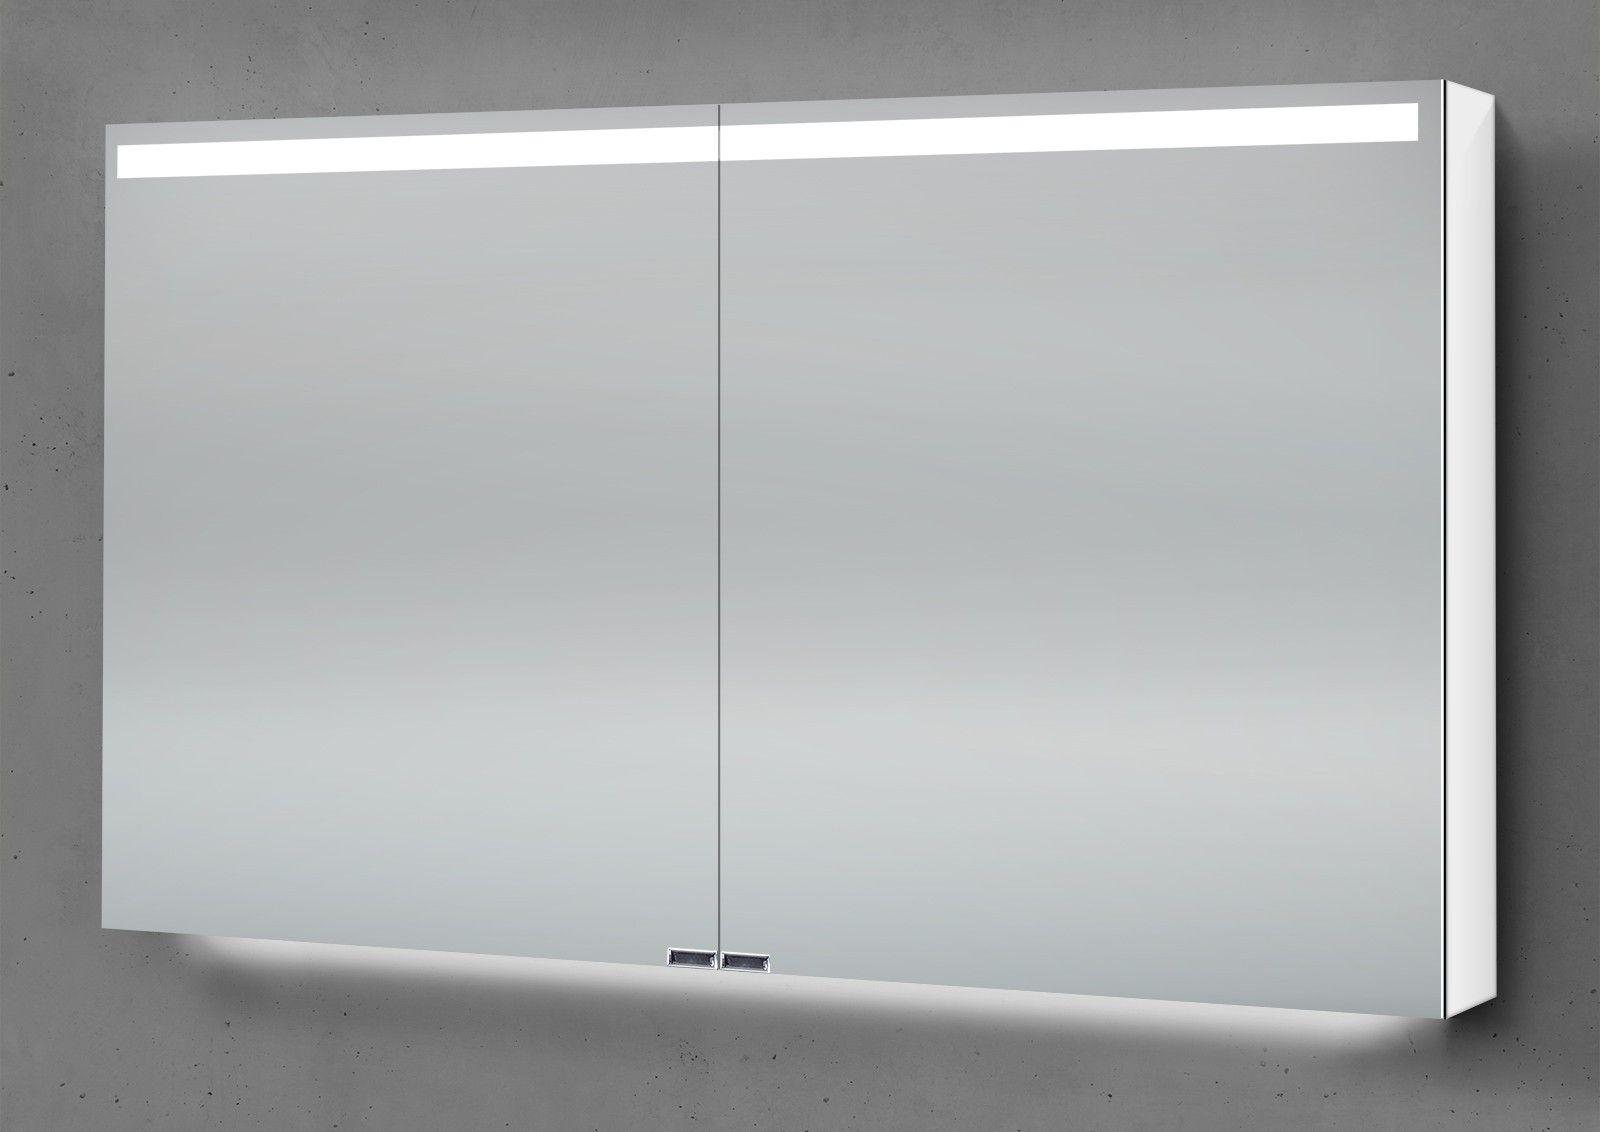 Designbaeder Com Spiegelschrank 120 Cm Spiegelschrank Led Beleuchtung